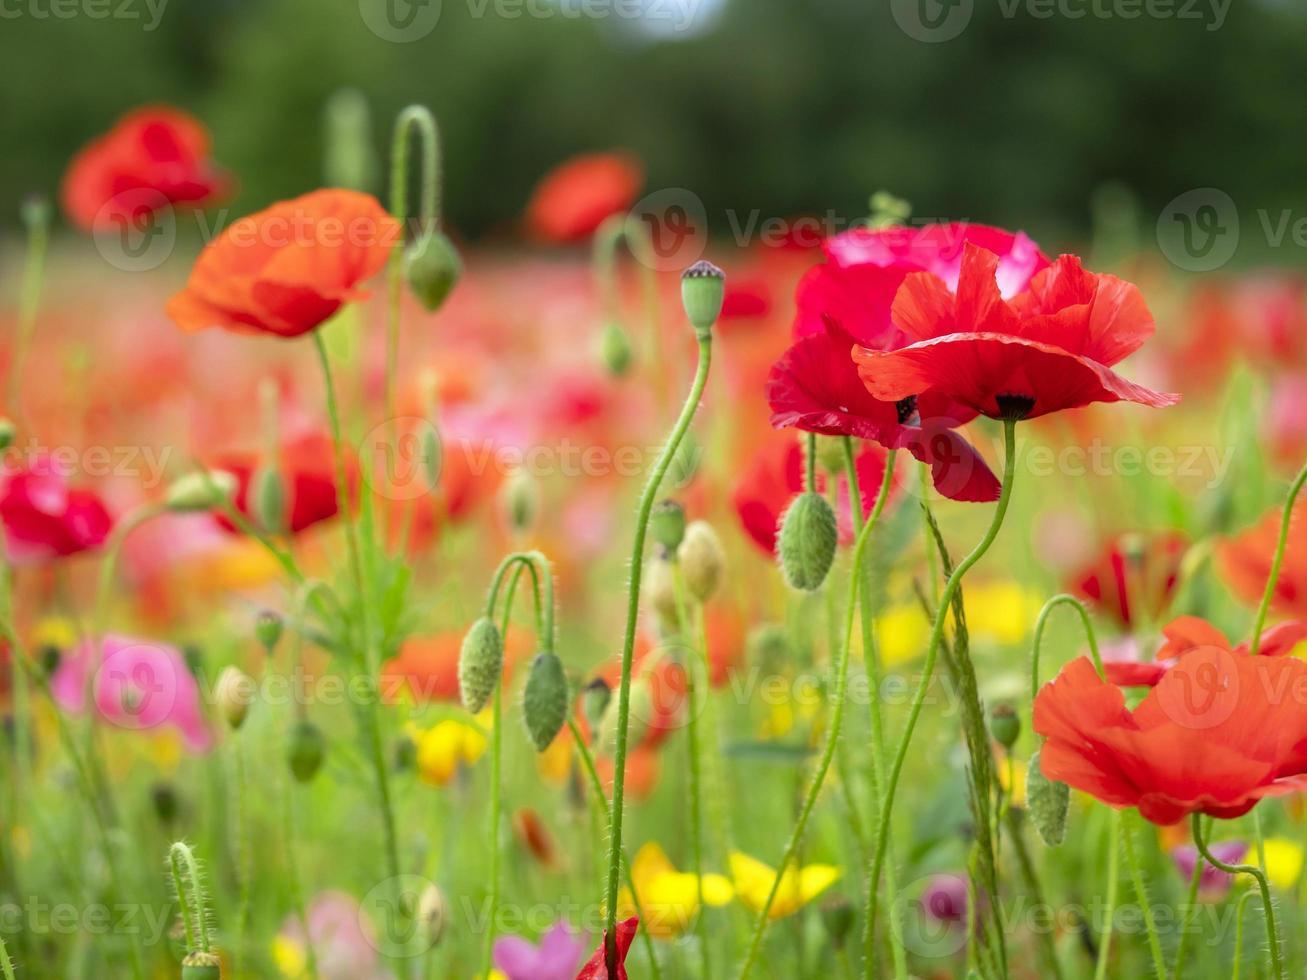 bunte Mohnblumen in einem Feld foto